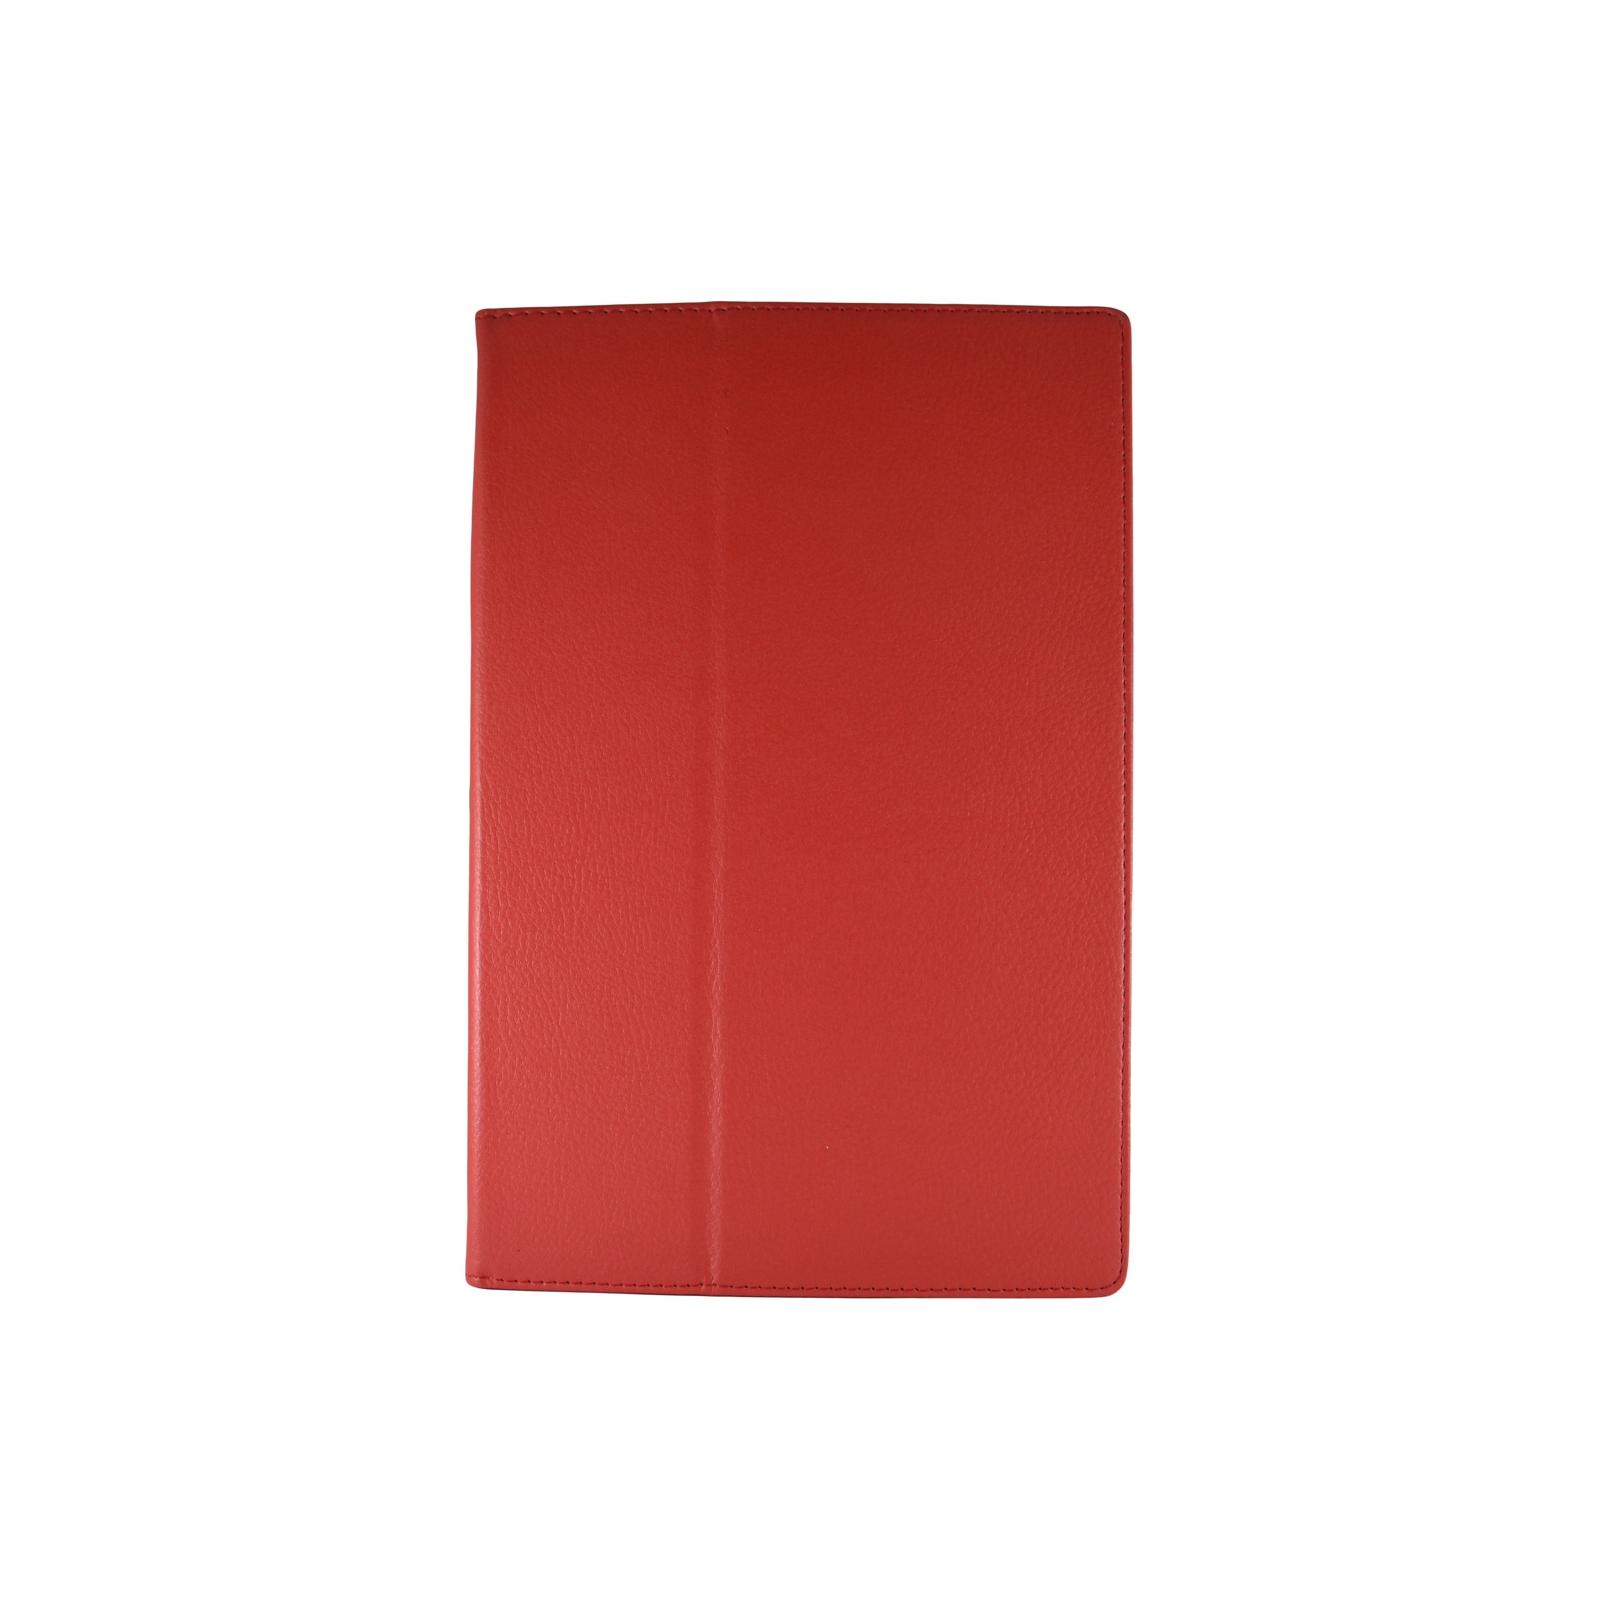 "Чехол для планшета Pro-case 10,1"" Pro-case Sony Tablet Z2 red (PC STZ2red)"